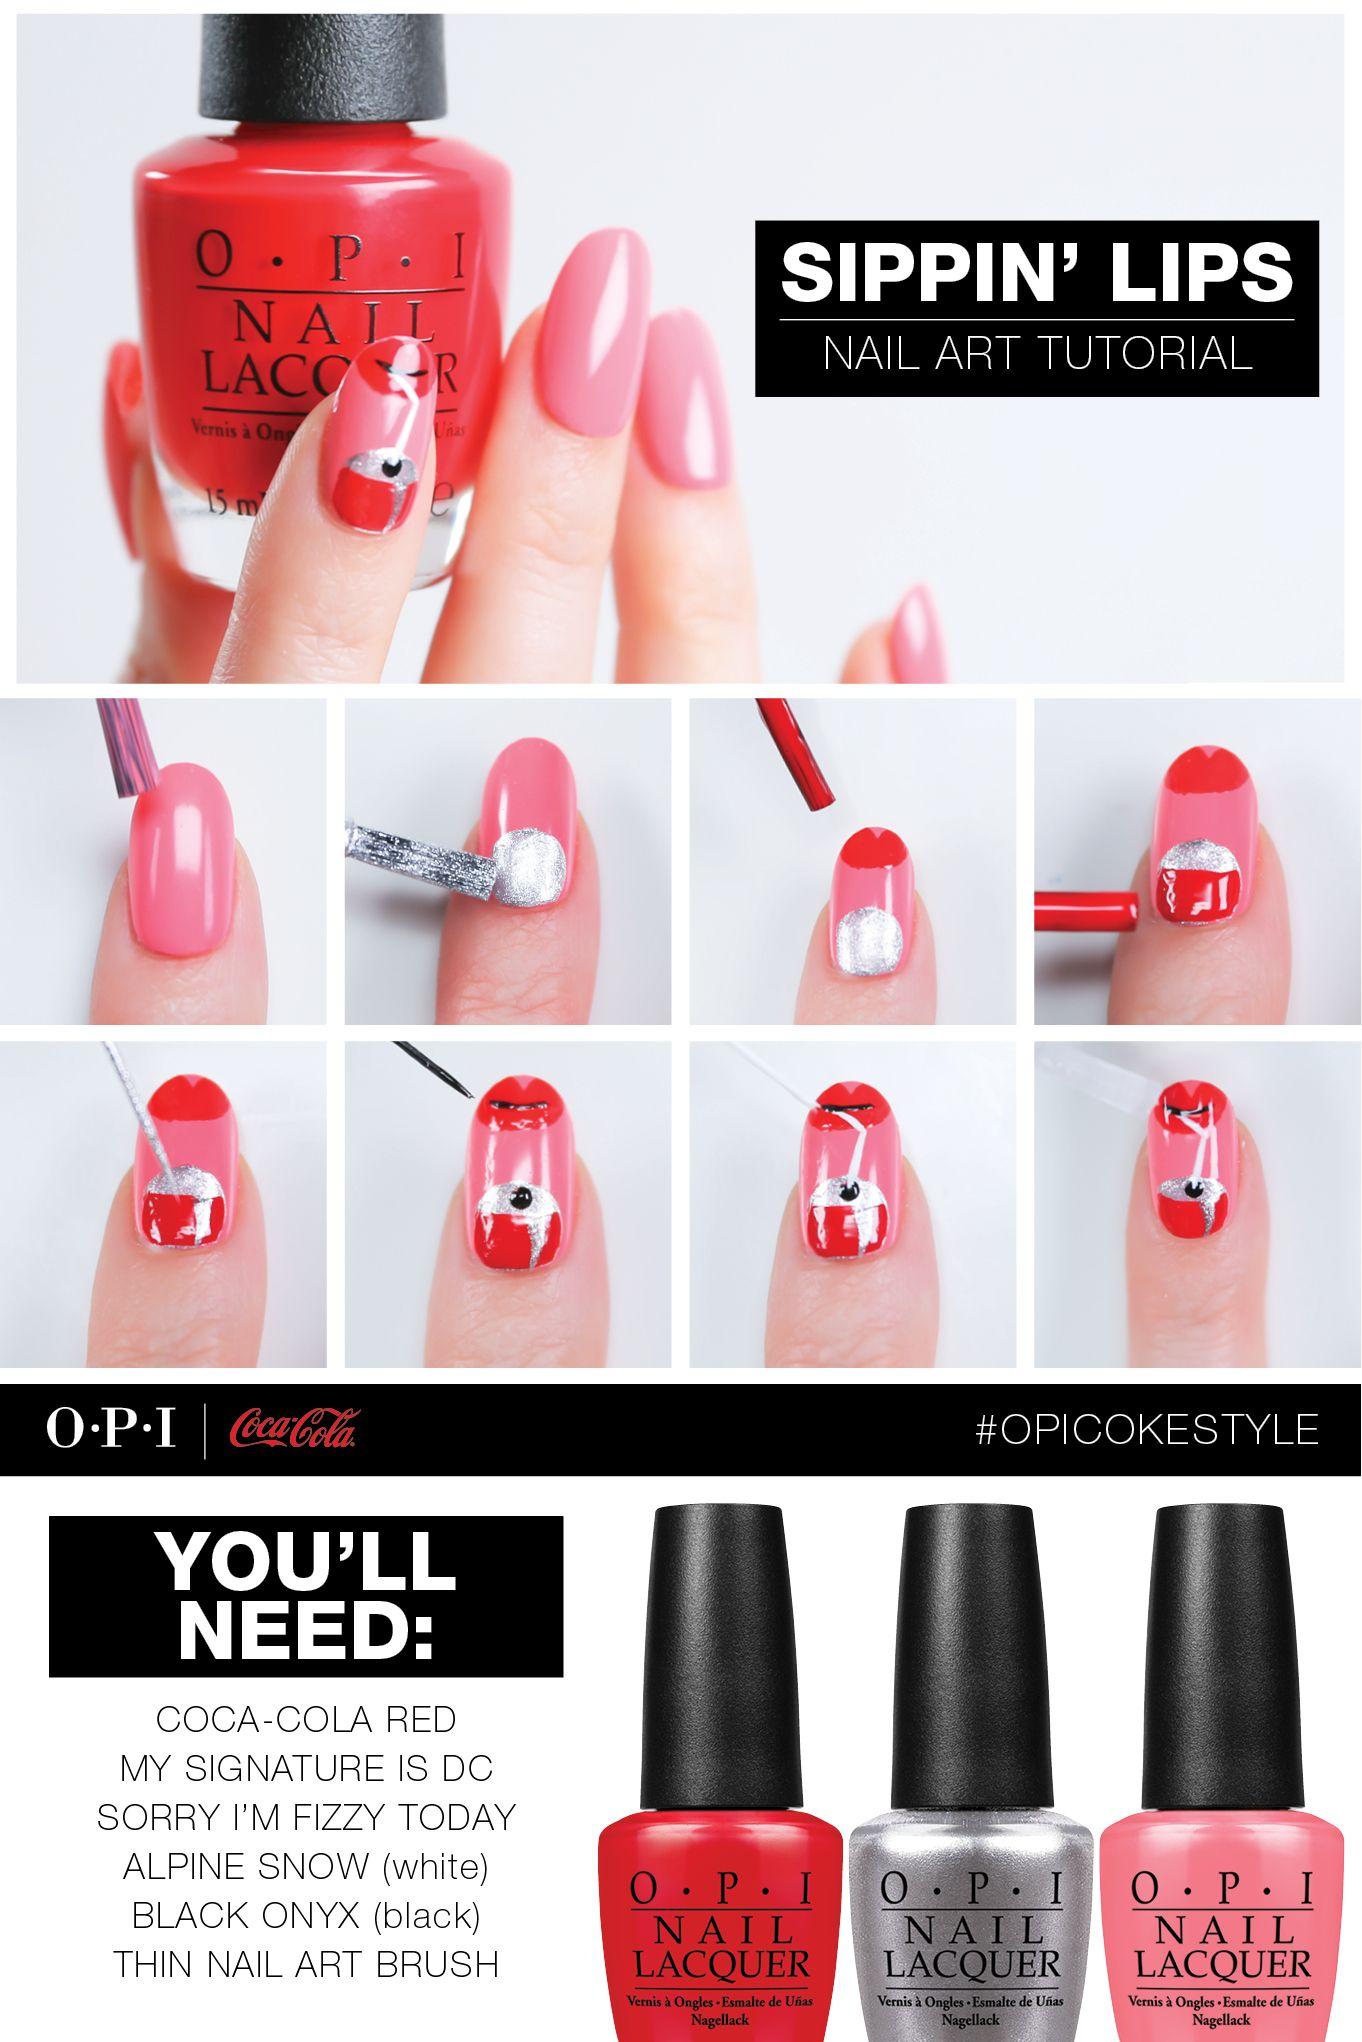 Sippin lips nail art tutorial using coca cola by opi shades sippin lips nail art tutorial using coca cola by opi shades opicokestyle prinsesfo Choice Image